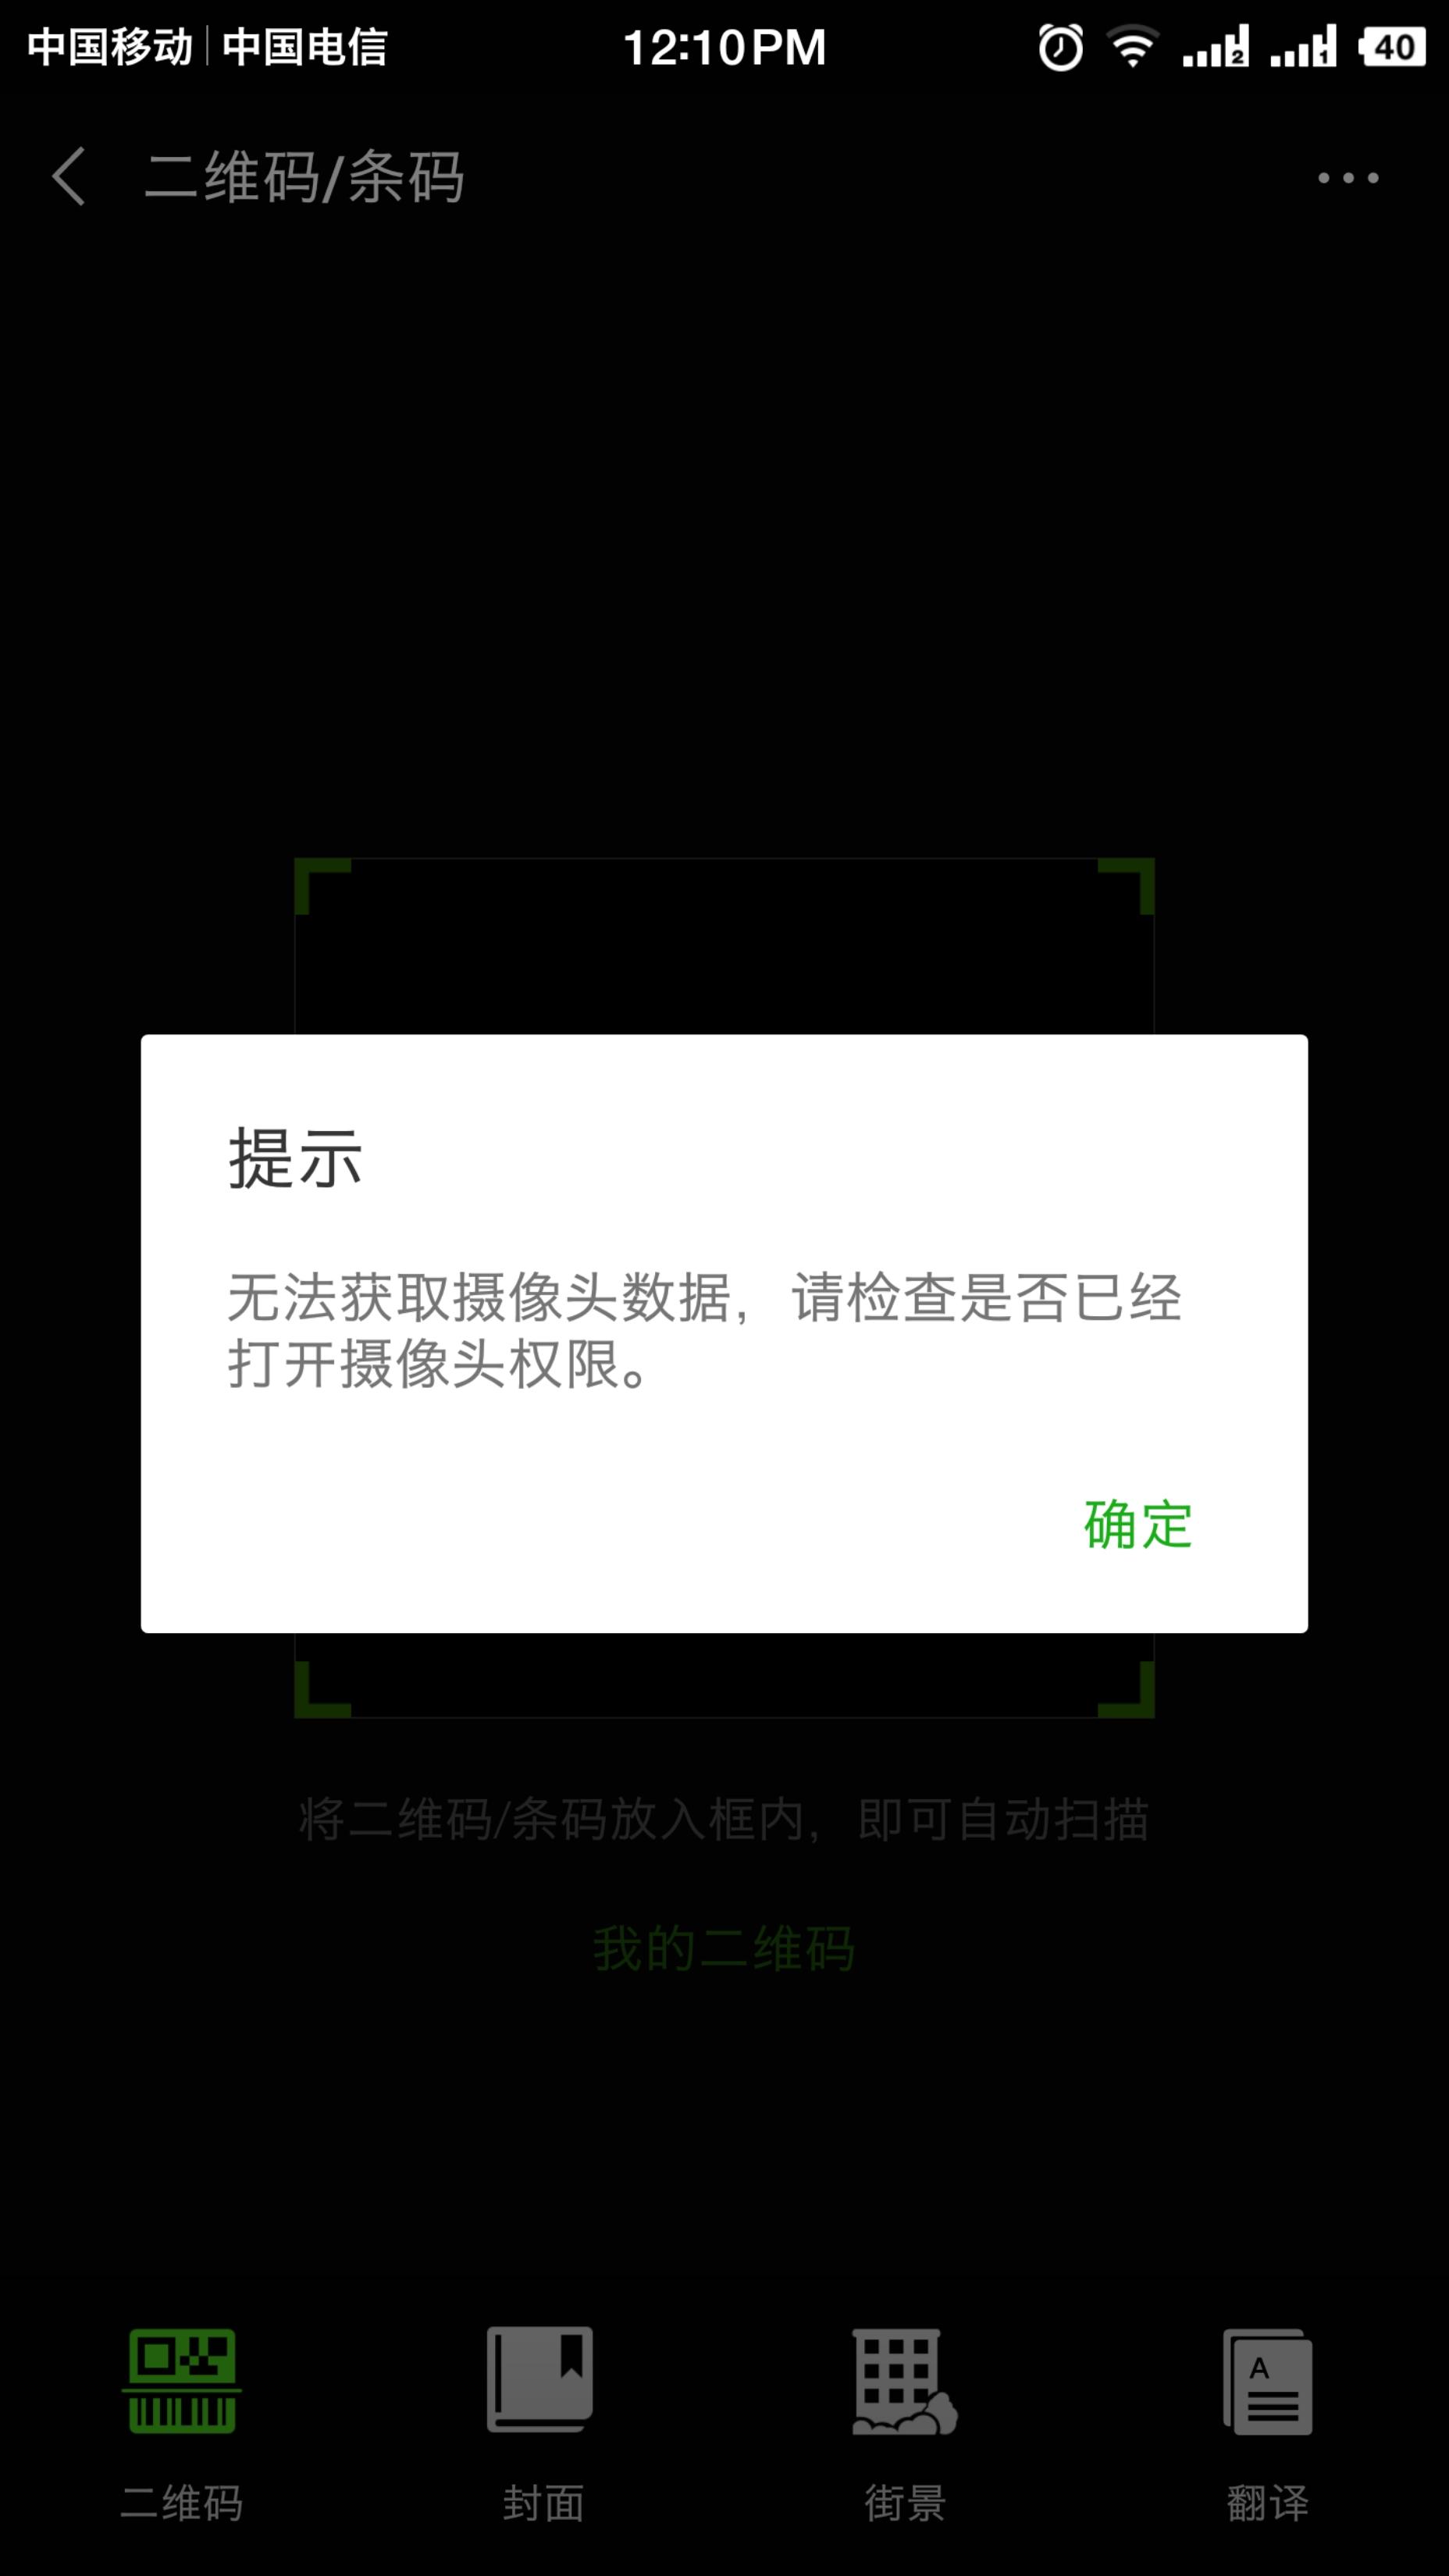 screenshot_2018-11-09-12-10-06-898_??.png